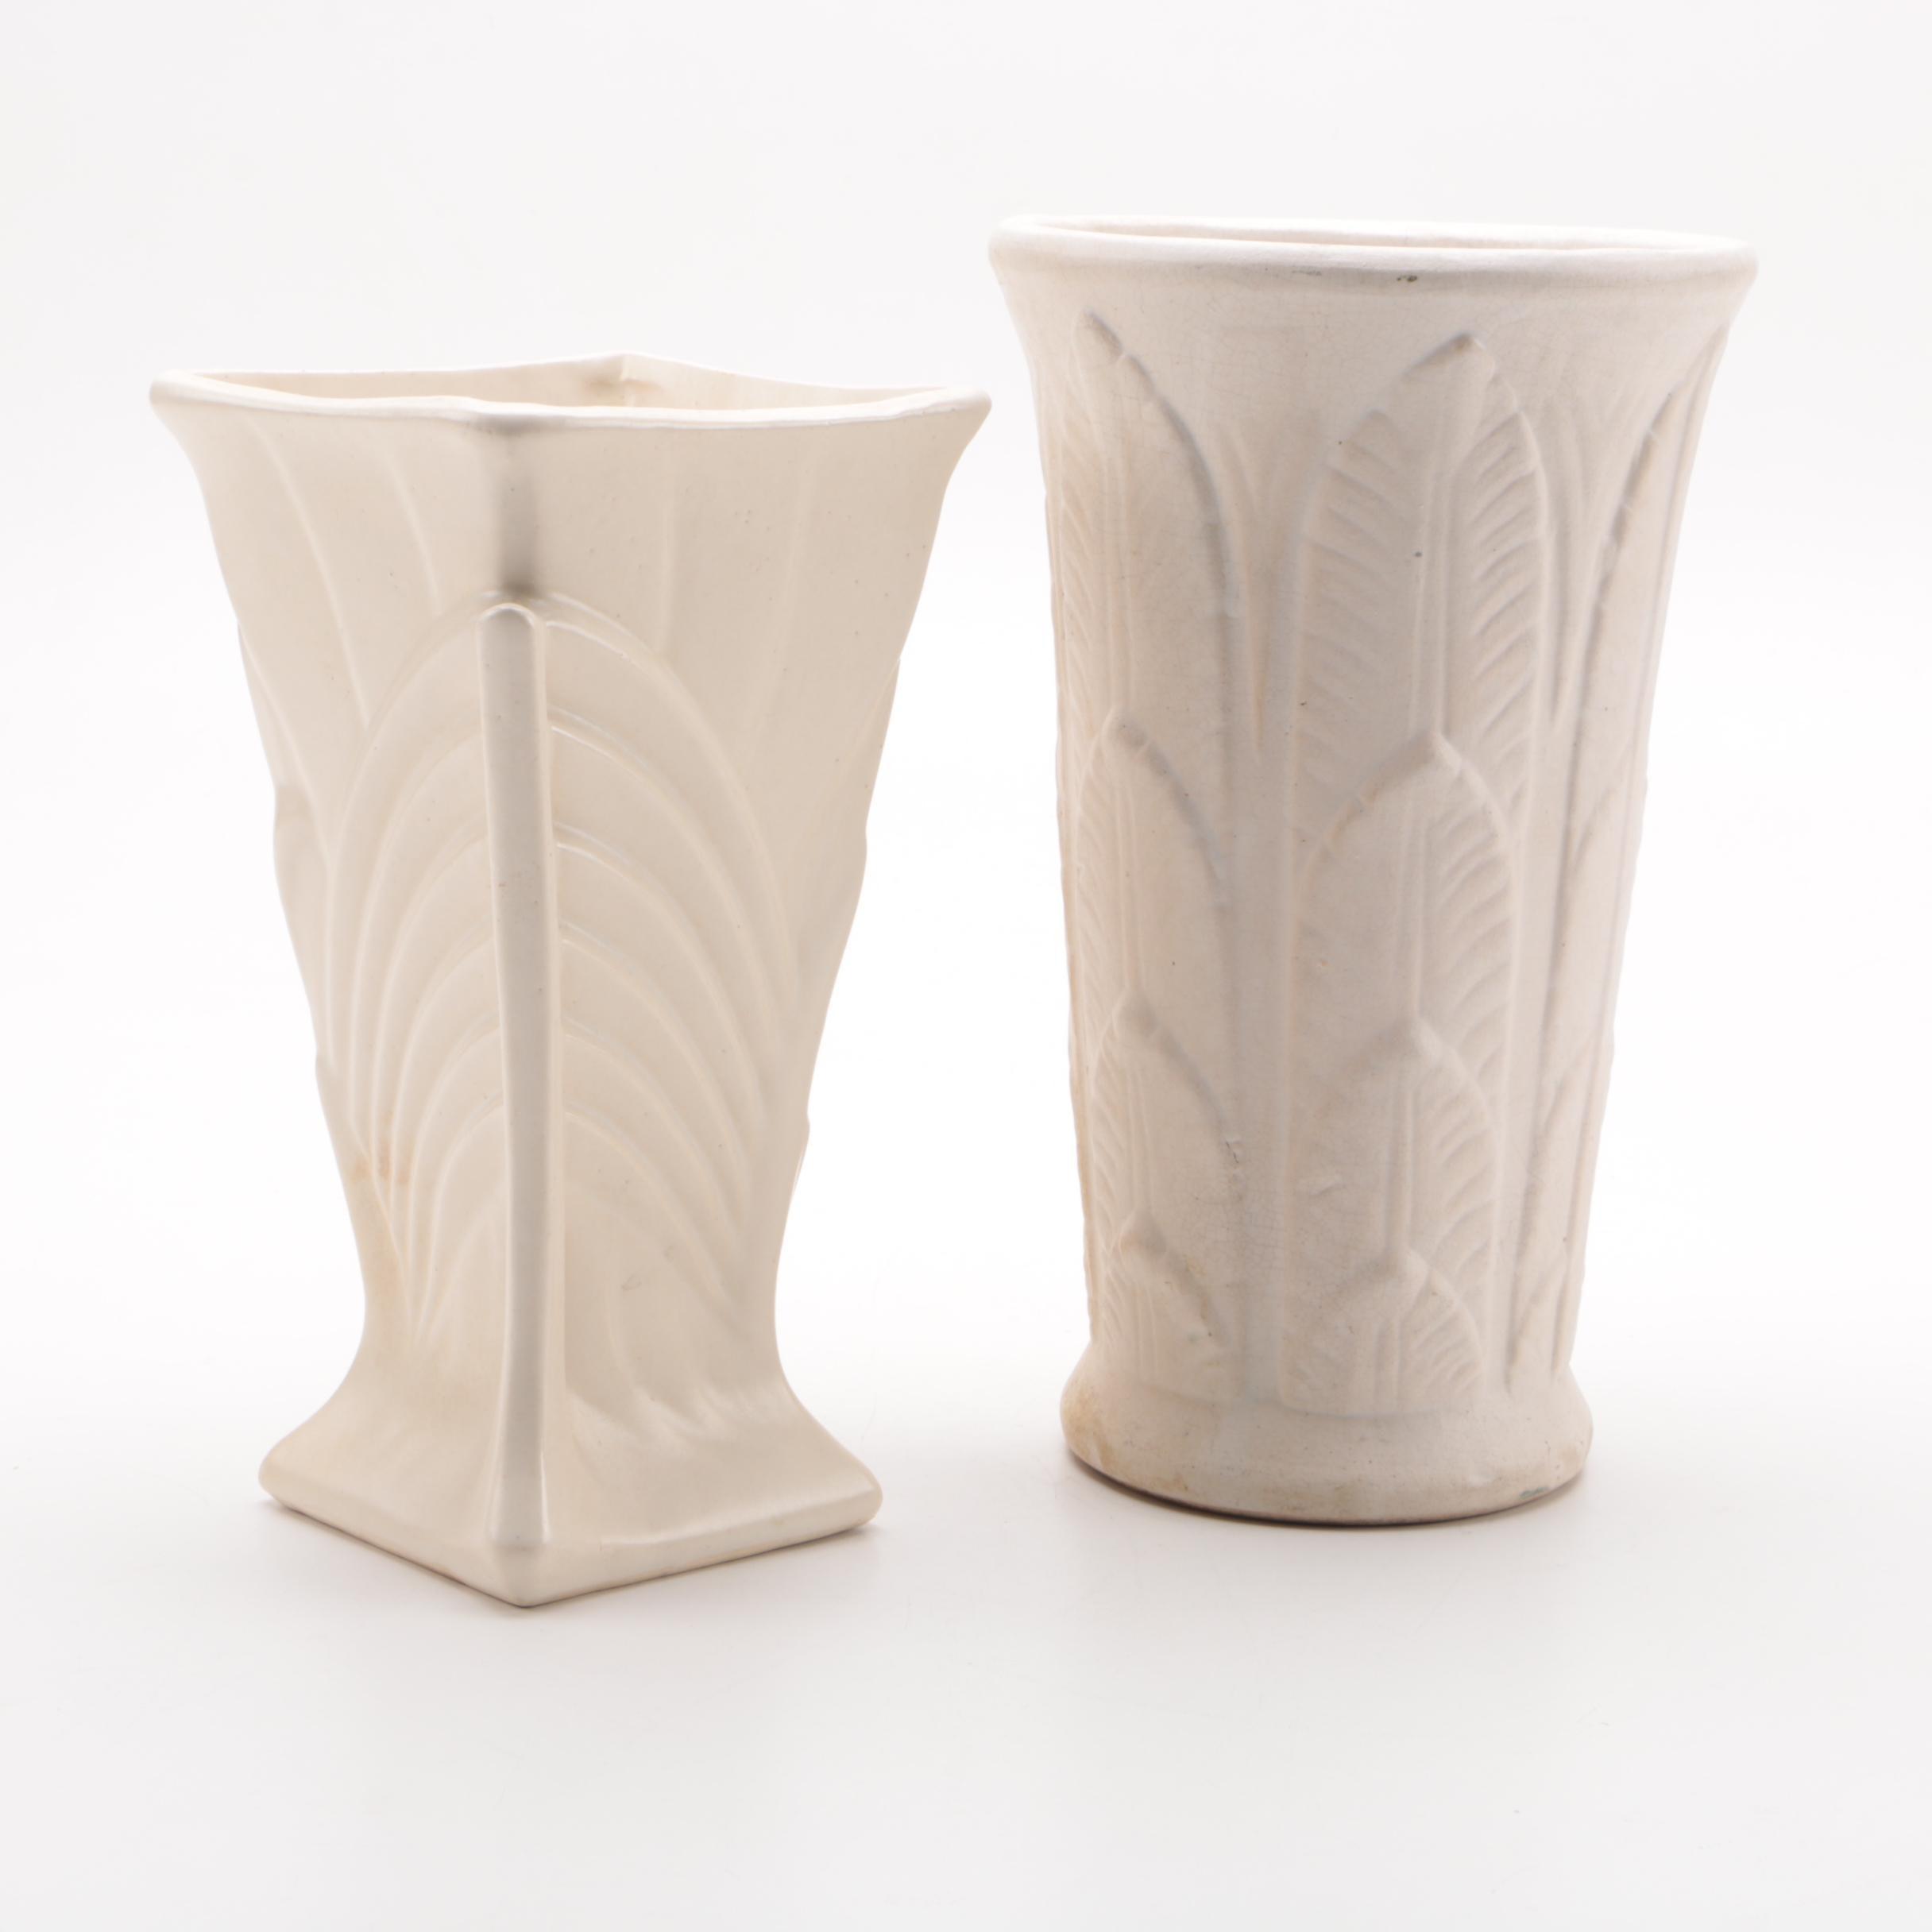 Art-Deco Style McCoy Pottery Vase with a White Glazed Vase